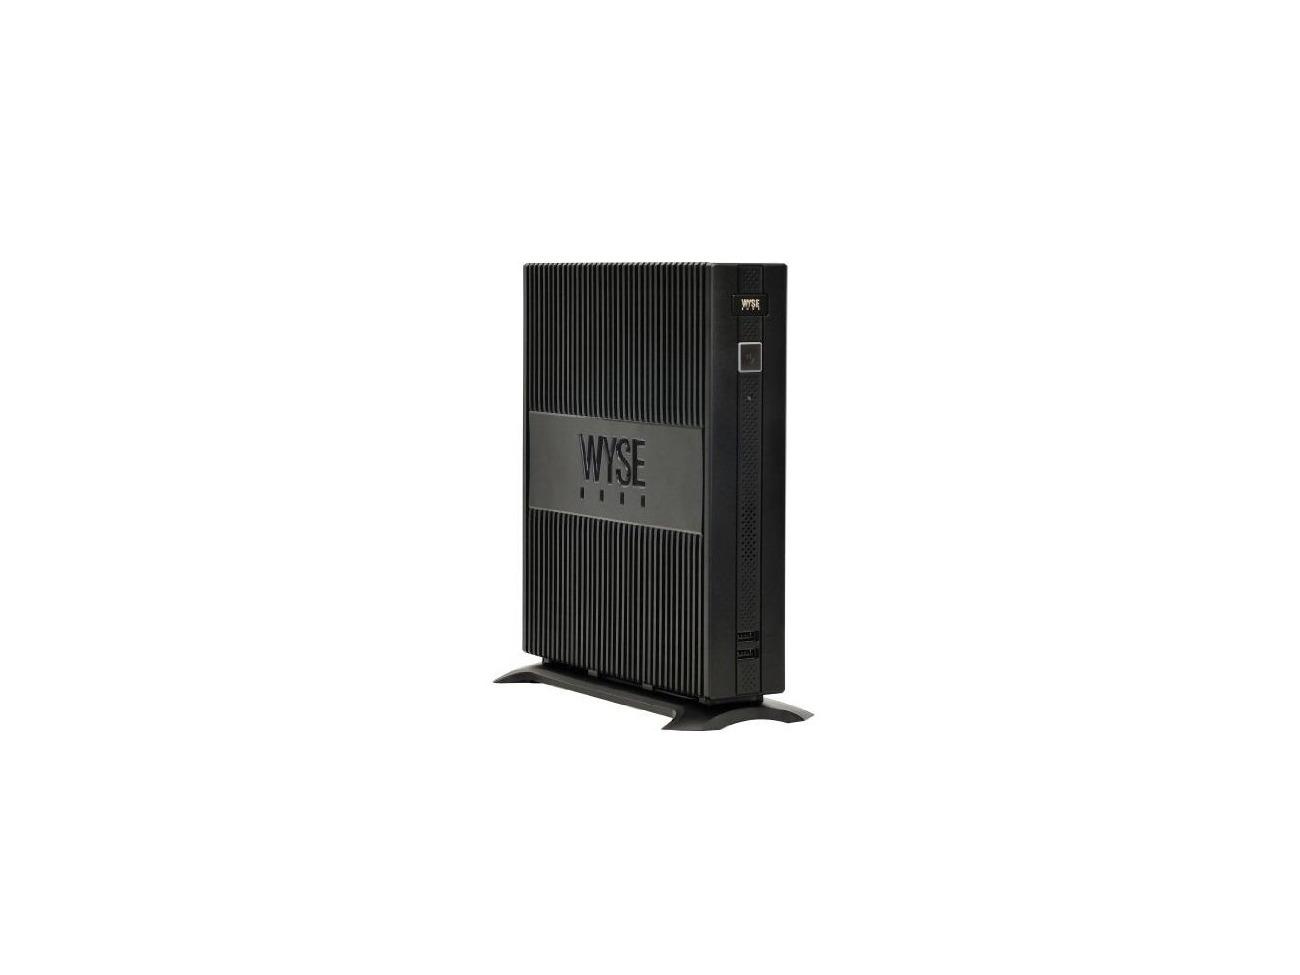 Buy Dell Wyse R10L 1 5 GHz 2950 g Black – Thin Clients (1 5